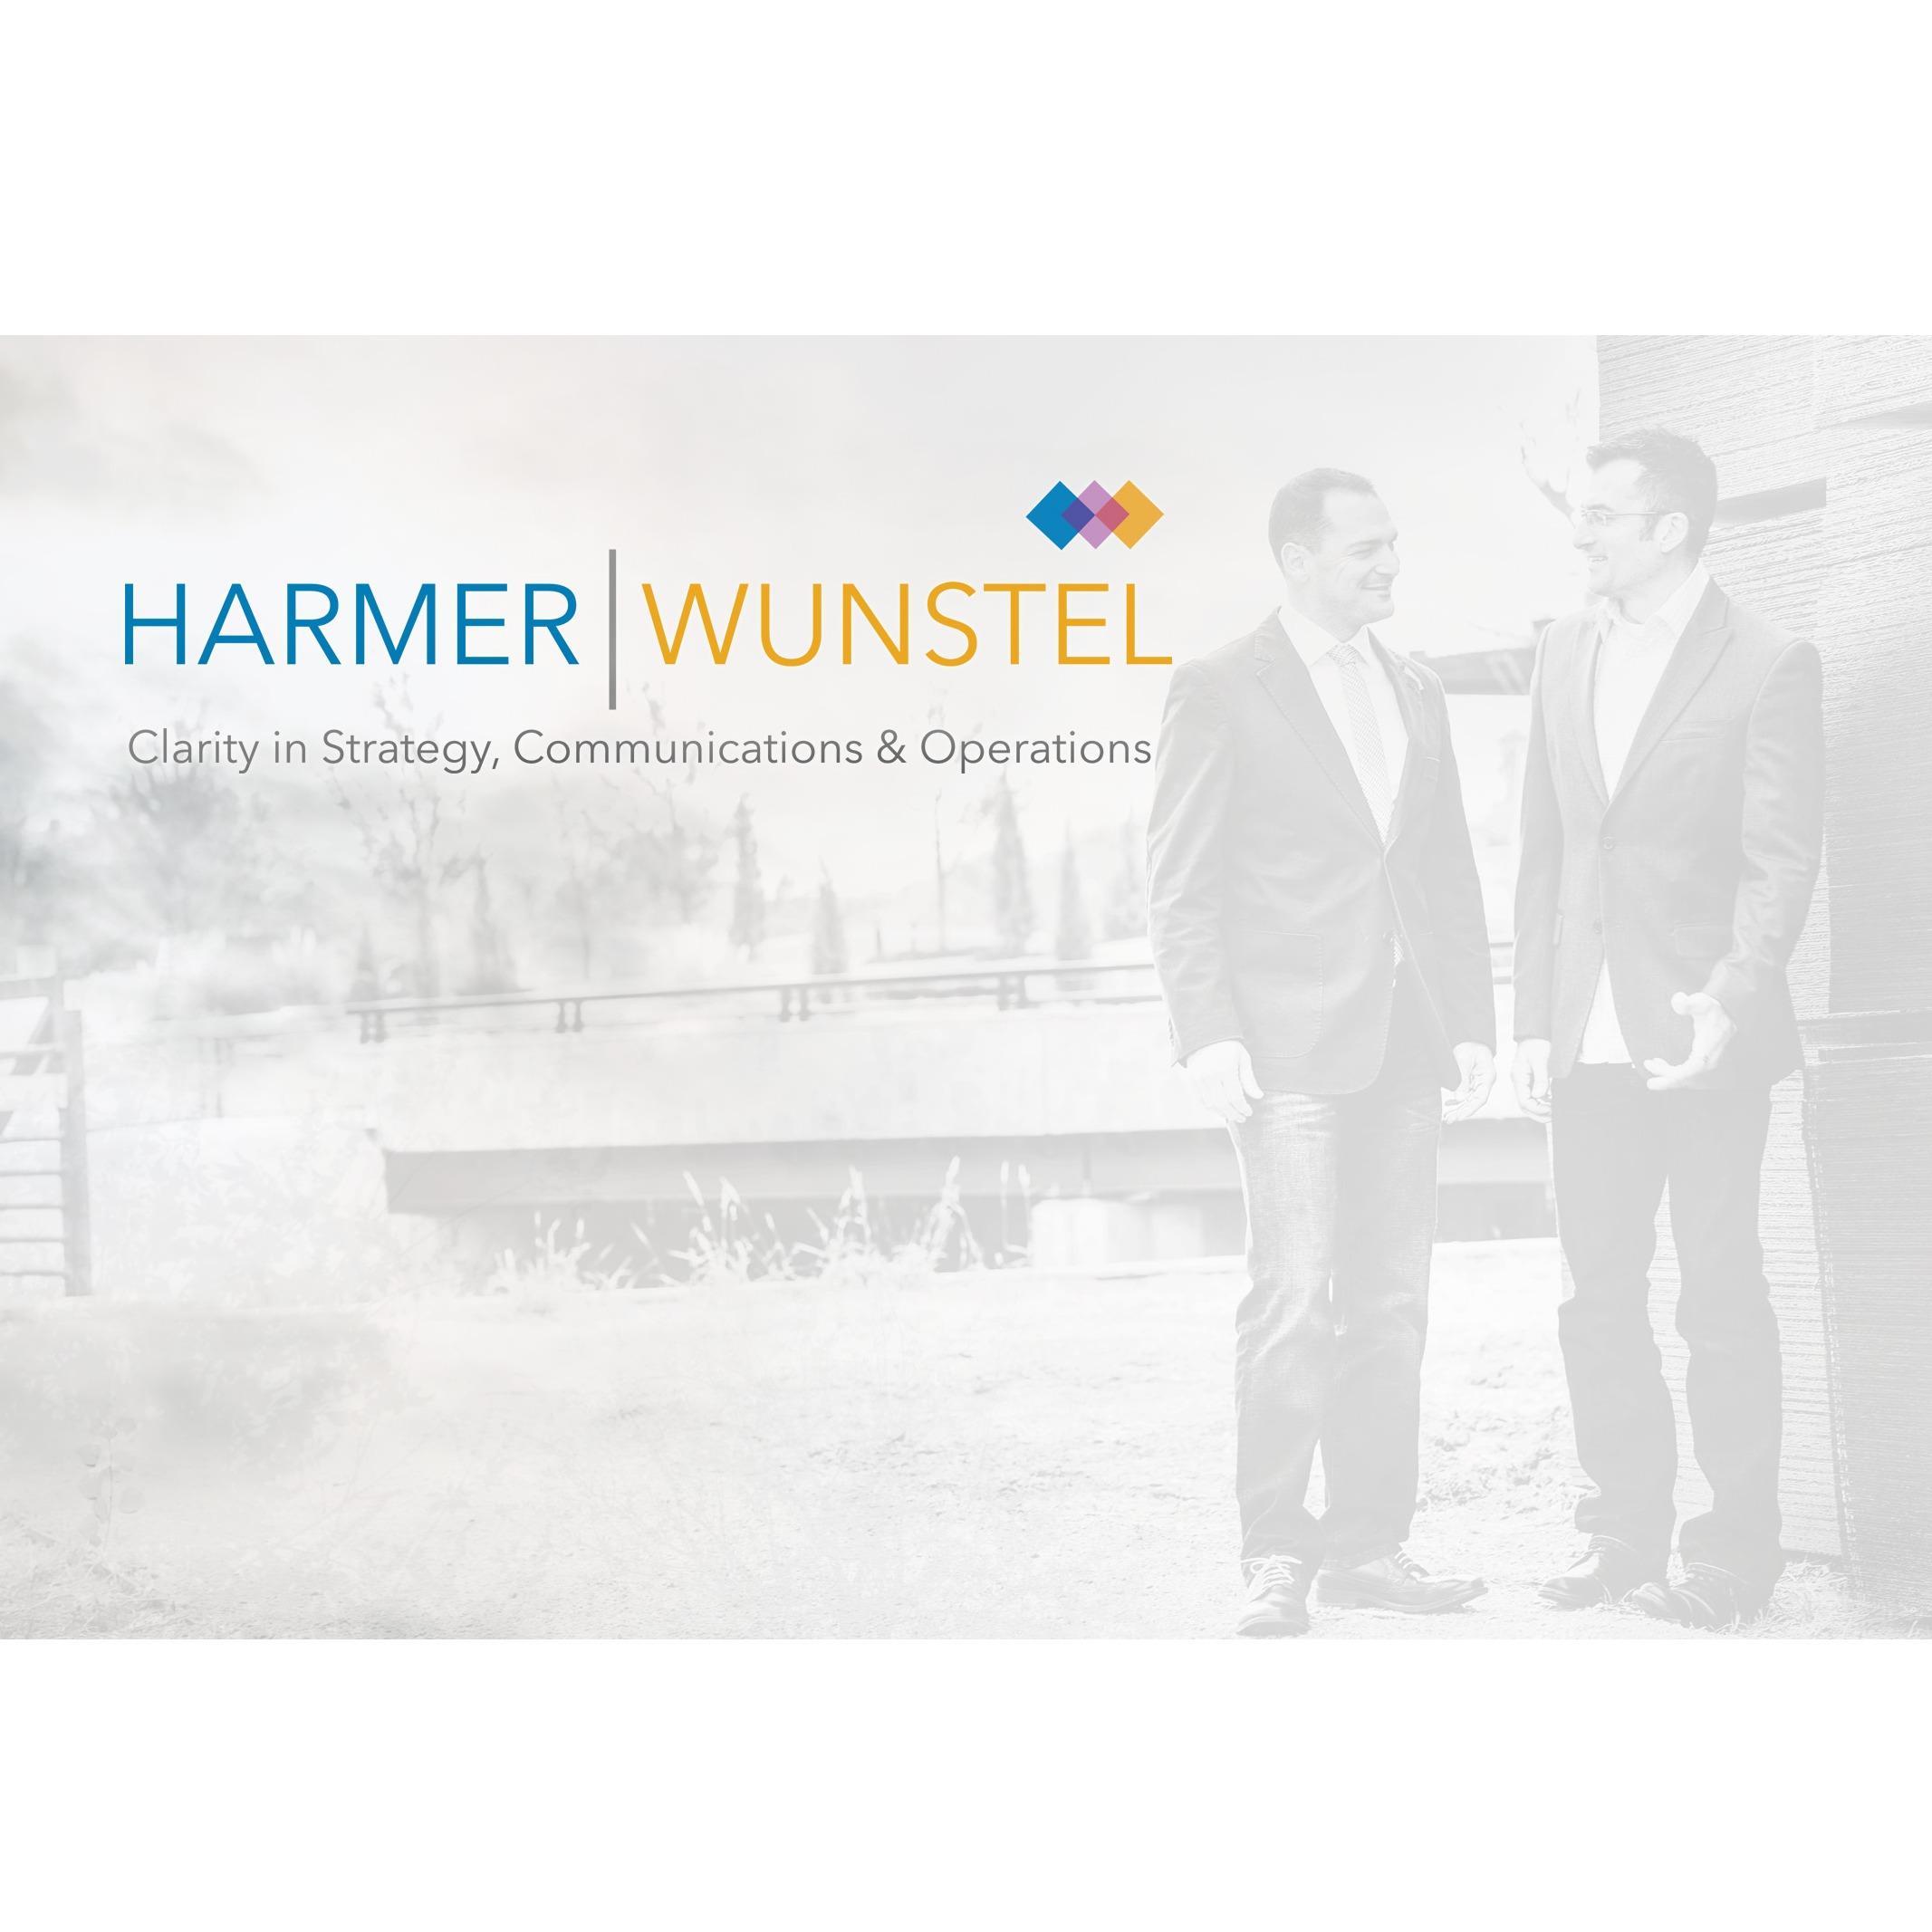 Harmer Wunstel - Flower Mound, TX 75028 - (972)638-7311 | ShowMeLocal.com